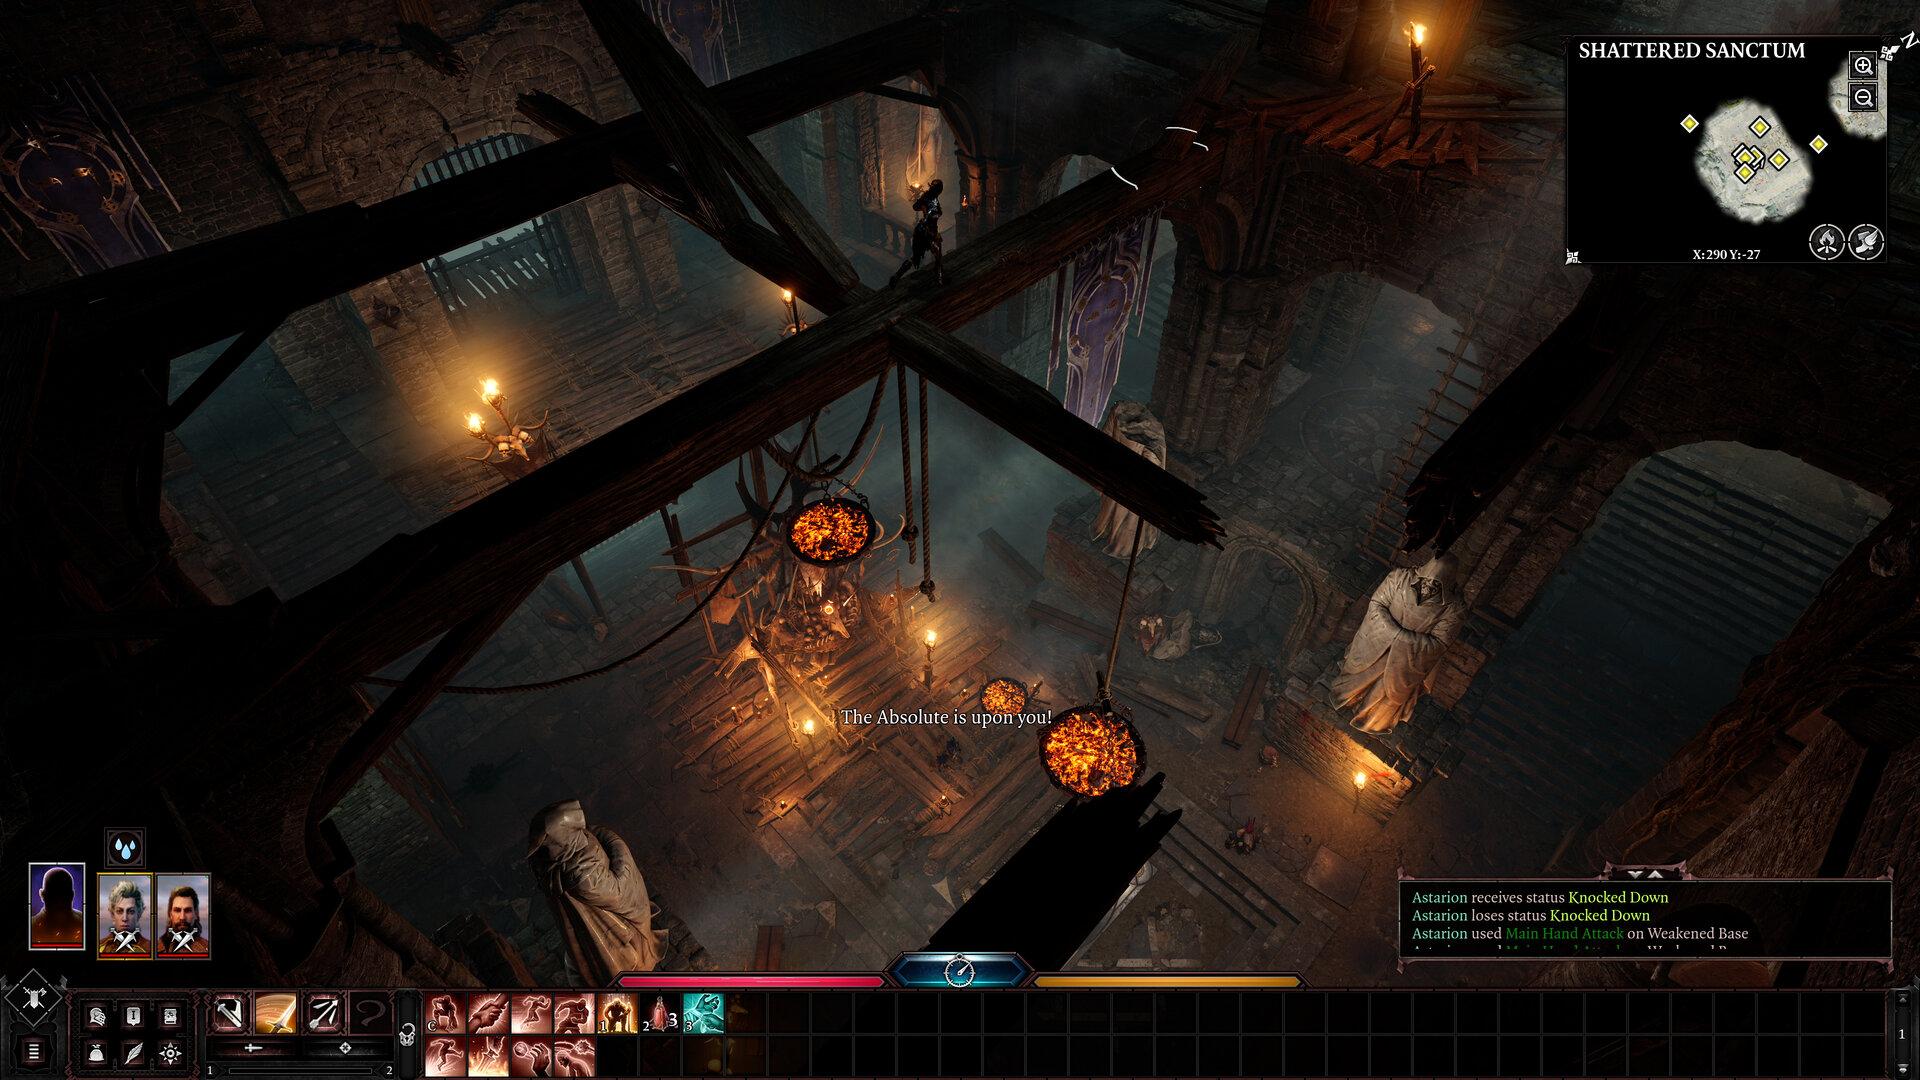 Baldur's Gate 3